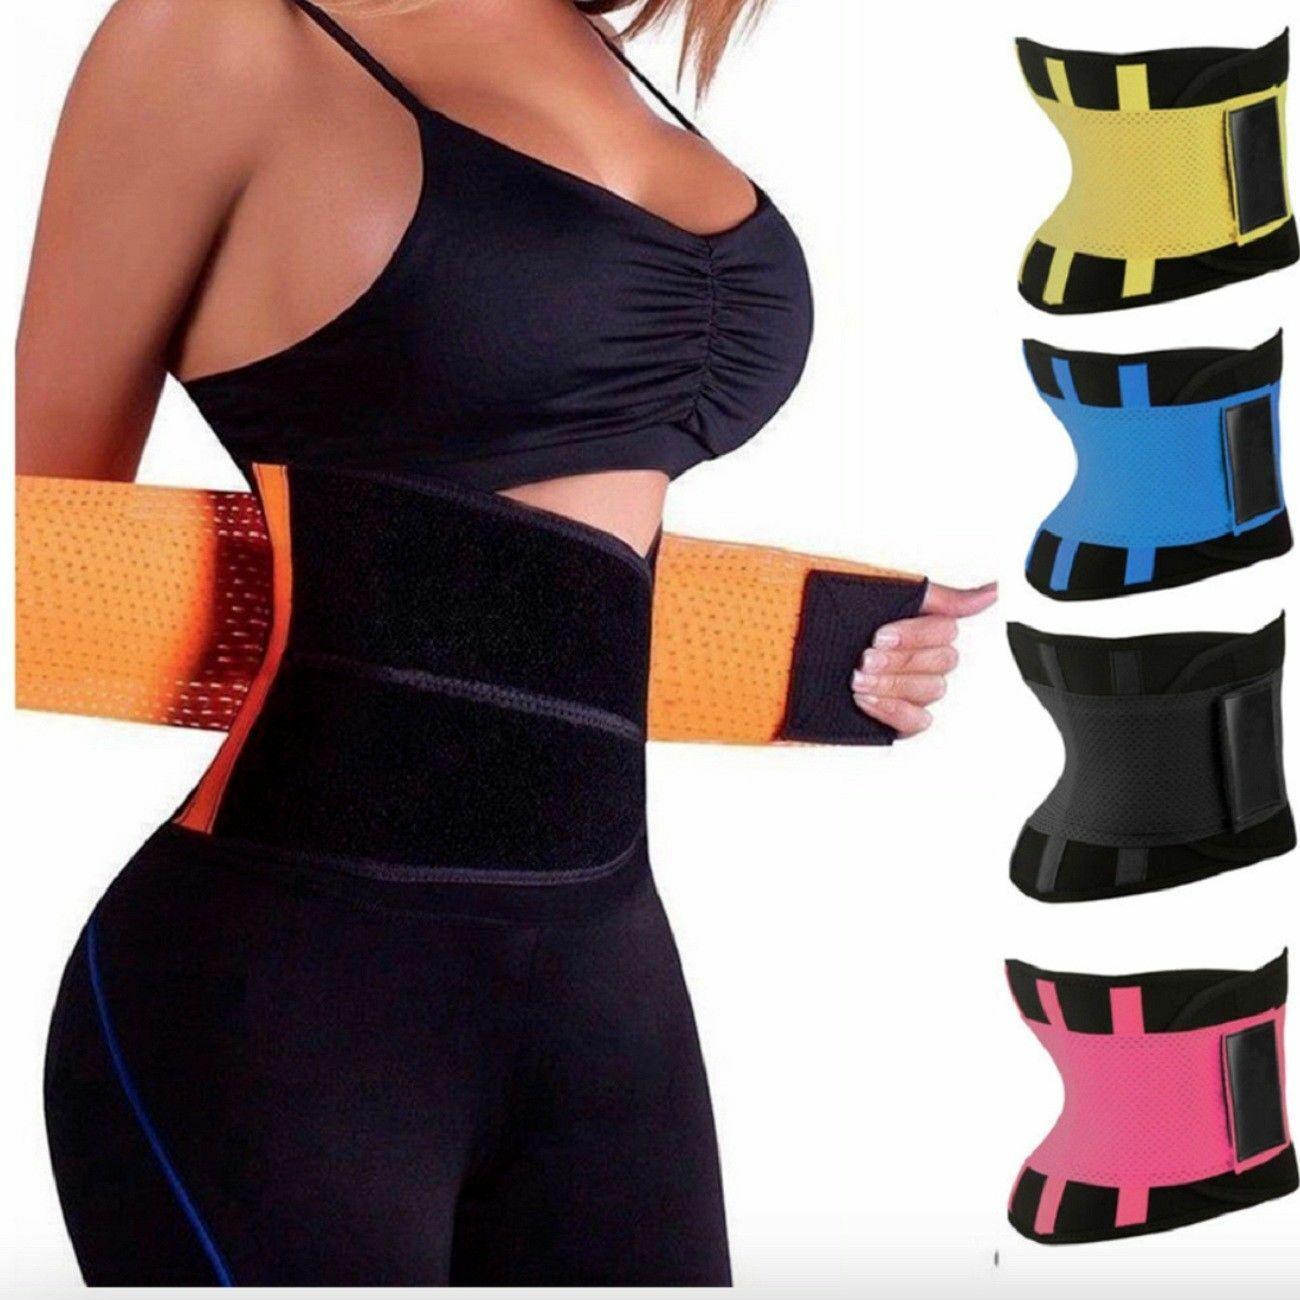 Elastic Waist Trainer Quick Weight Loss Products Men Women K